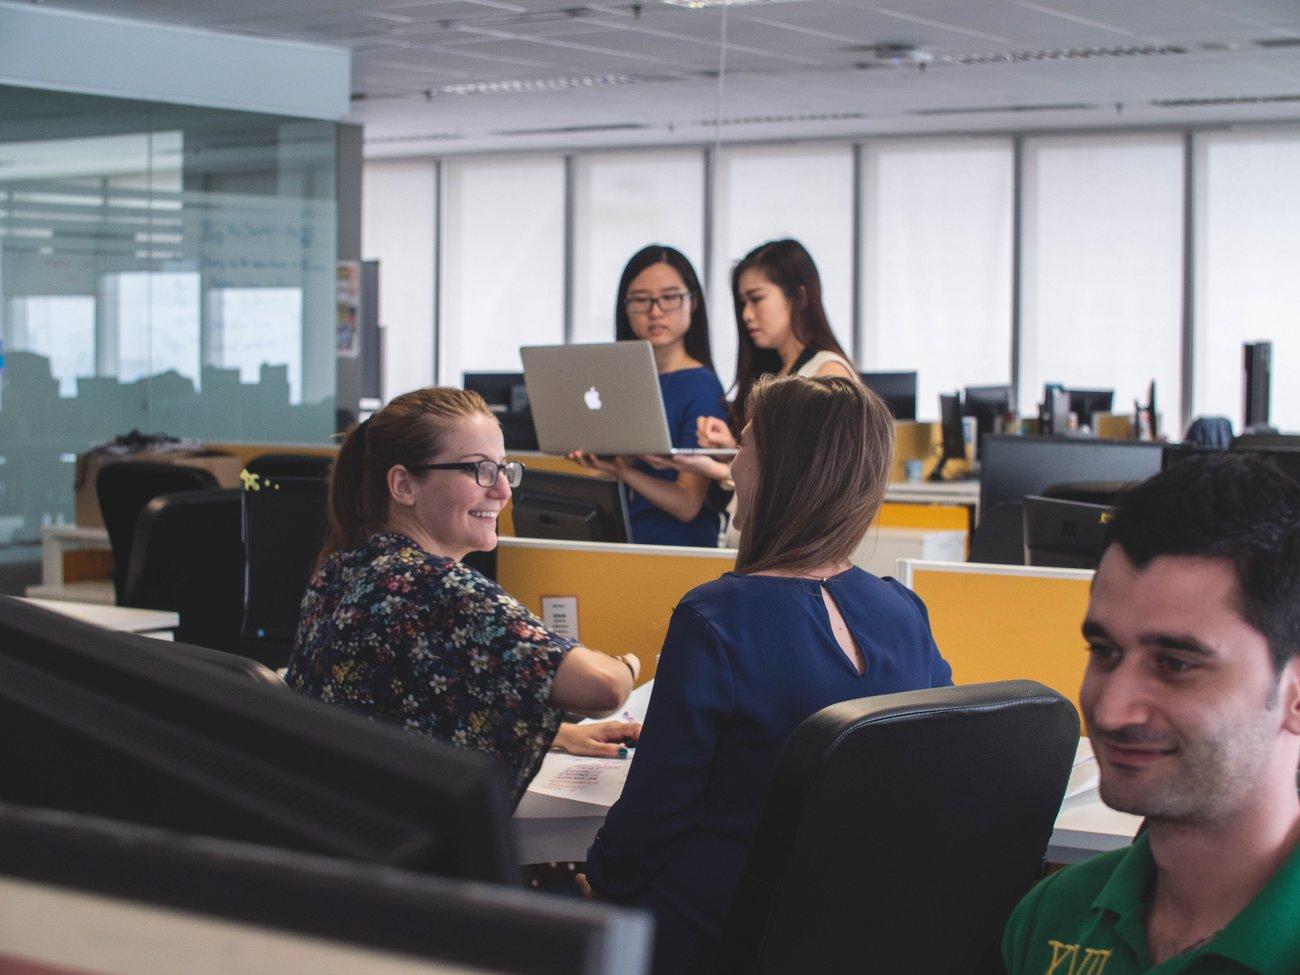 Frauen arbeiten im Büro